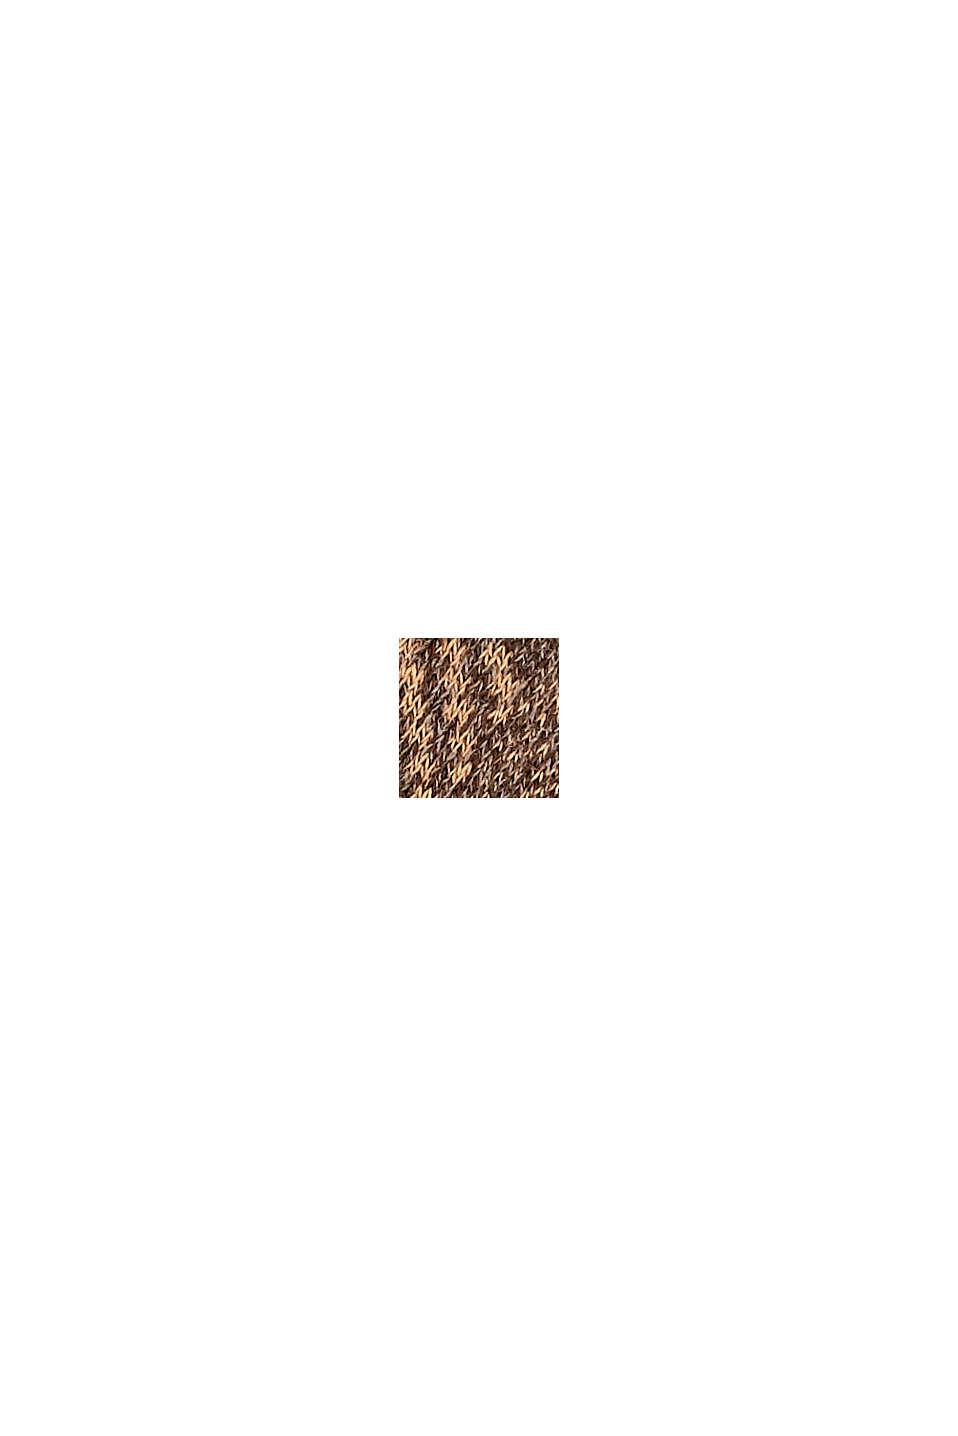 Con lana: calze fantasia in misto cotone, TEAK MELANGE, swatch